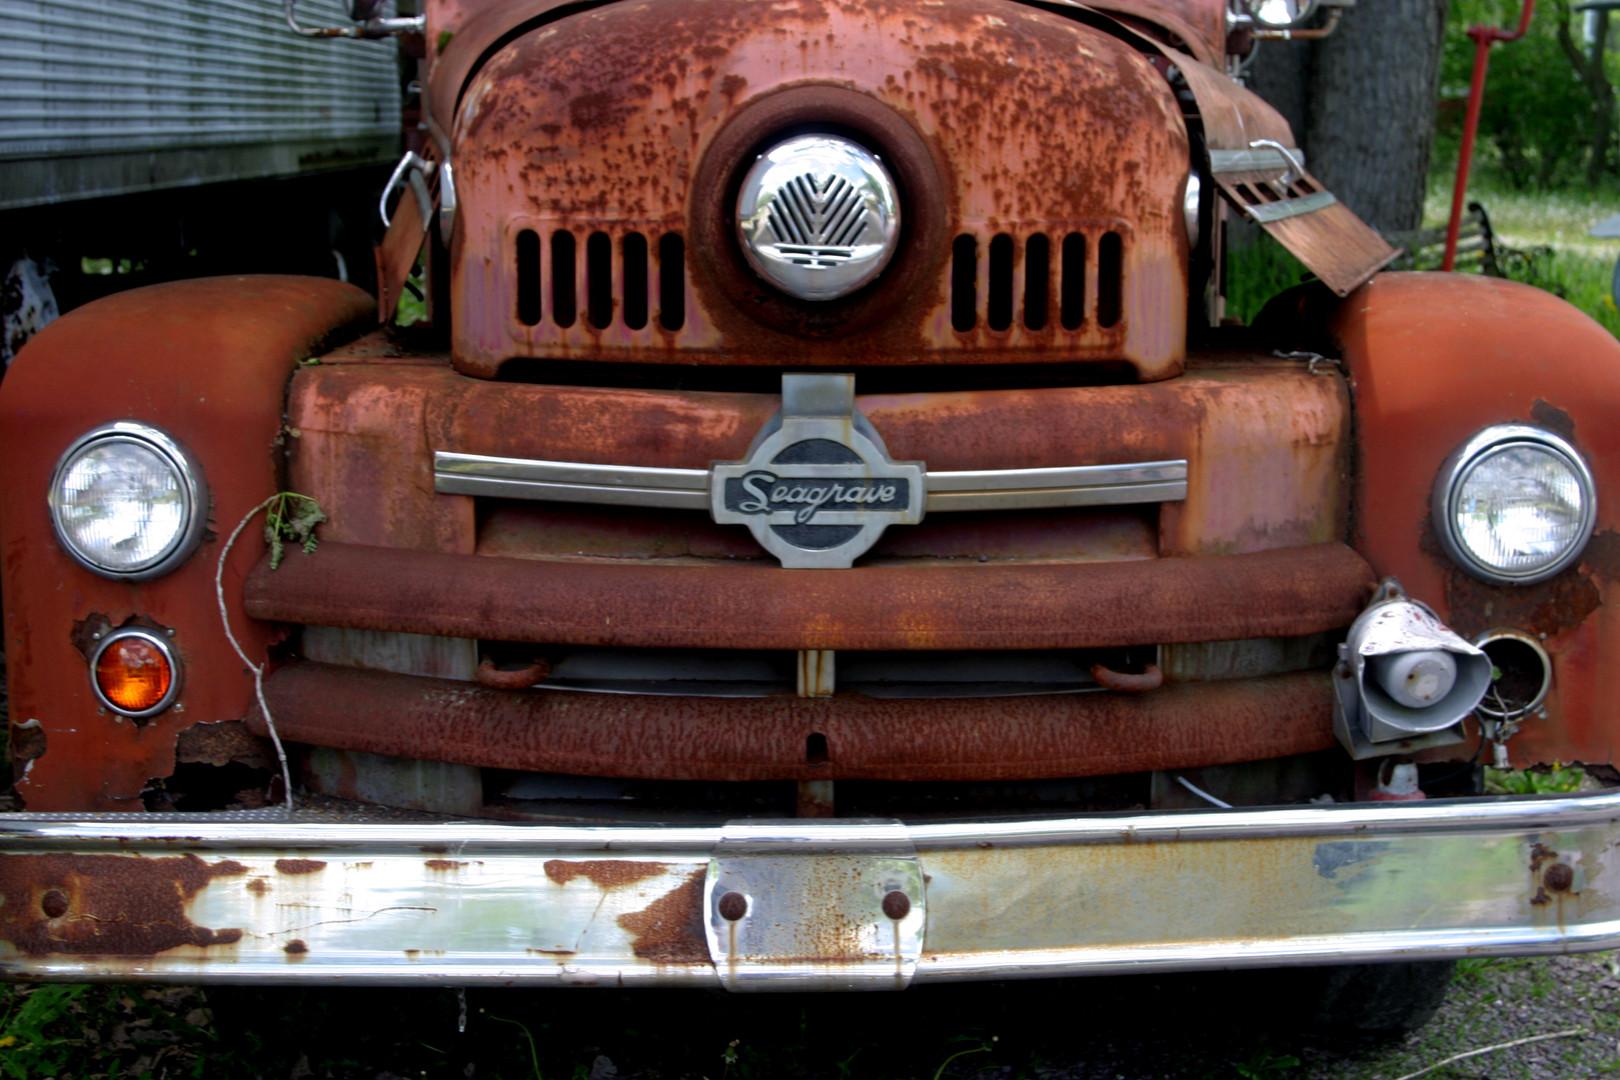 Junkyard Seagrave truck grill 08.jpg